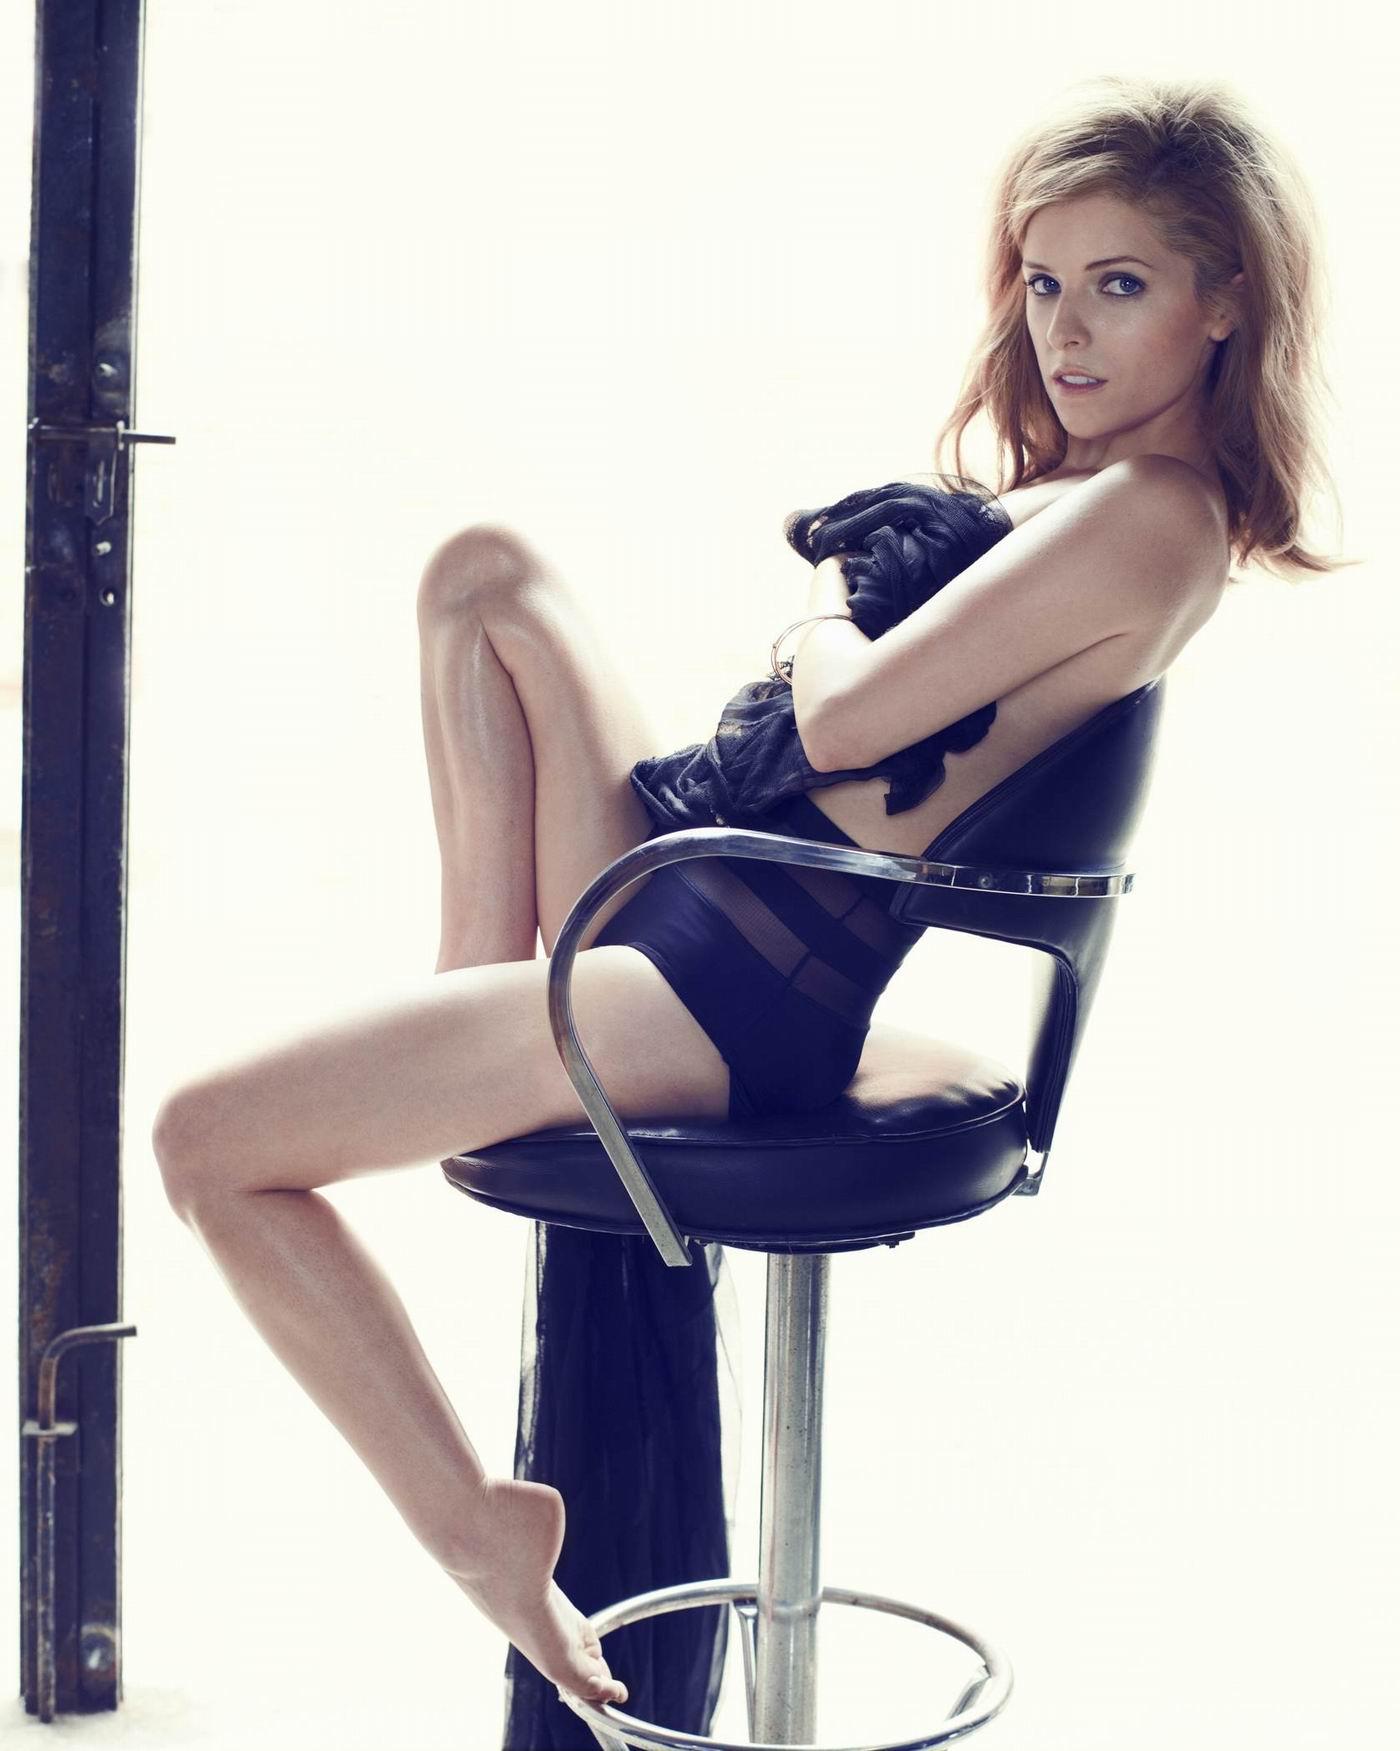 Анна Кендрик (Anna Kendrick) - GQ Сентябрь 2013